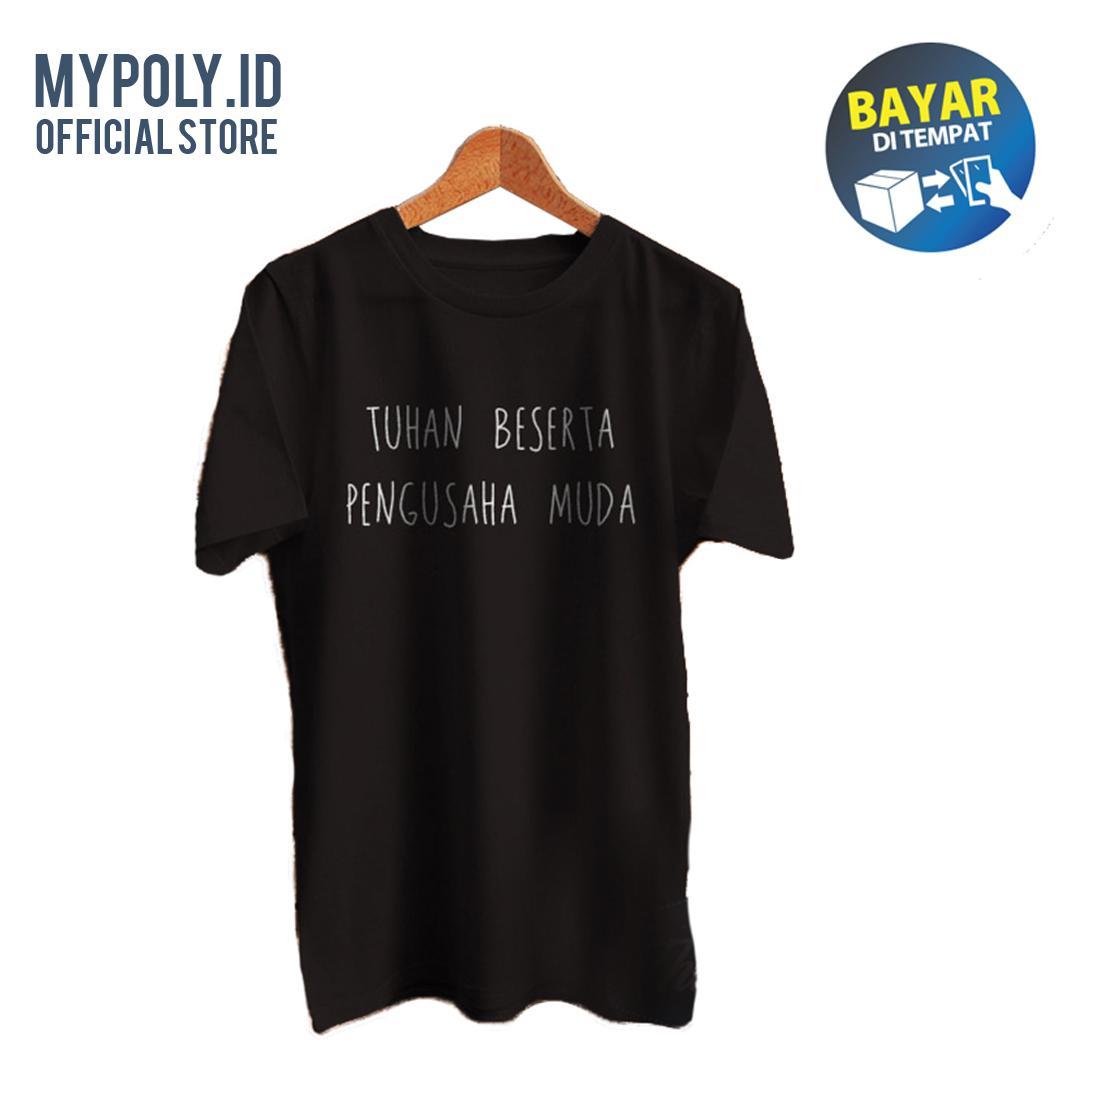 Kaos Premium Mypoly.ID / Baju Distro / Tshirt Casual Pria / Fashion Atasan / TUHAN BESERTA PENGUSAHA MUDA Kaos Vanwin BKSPC